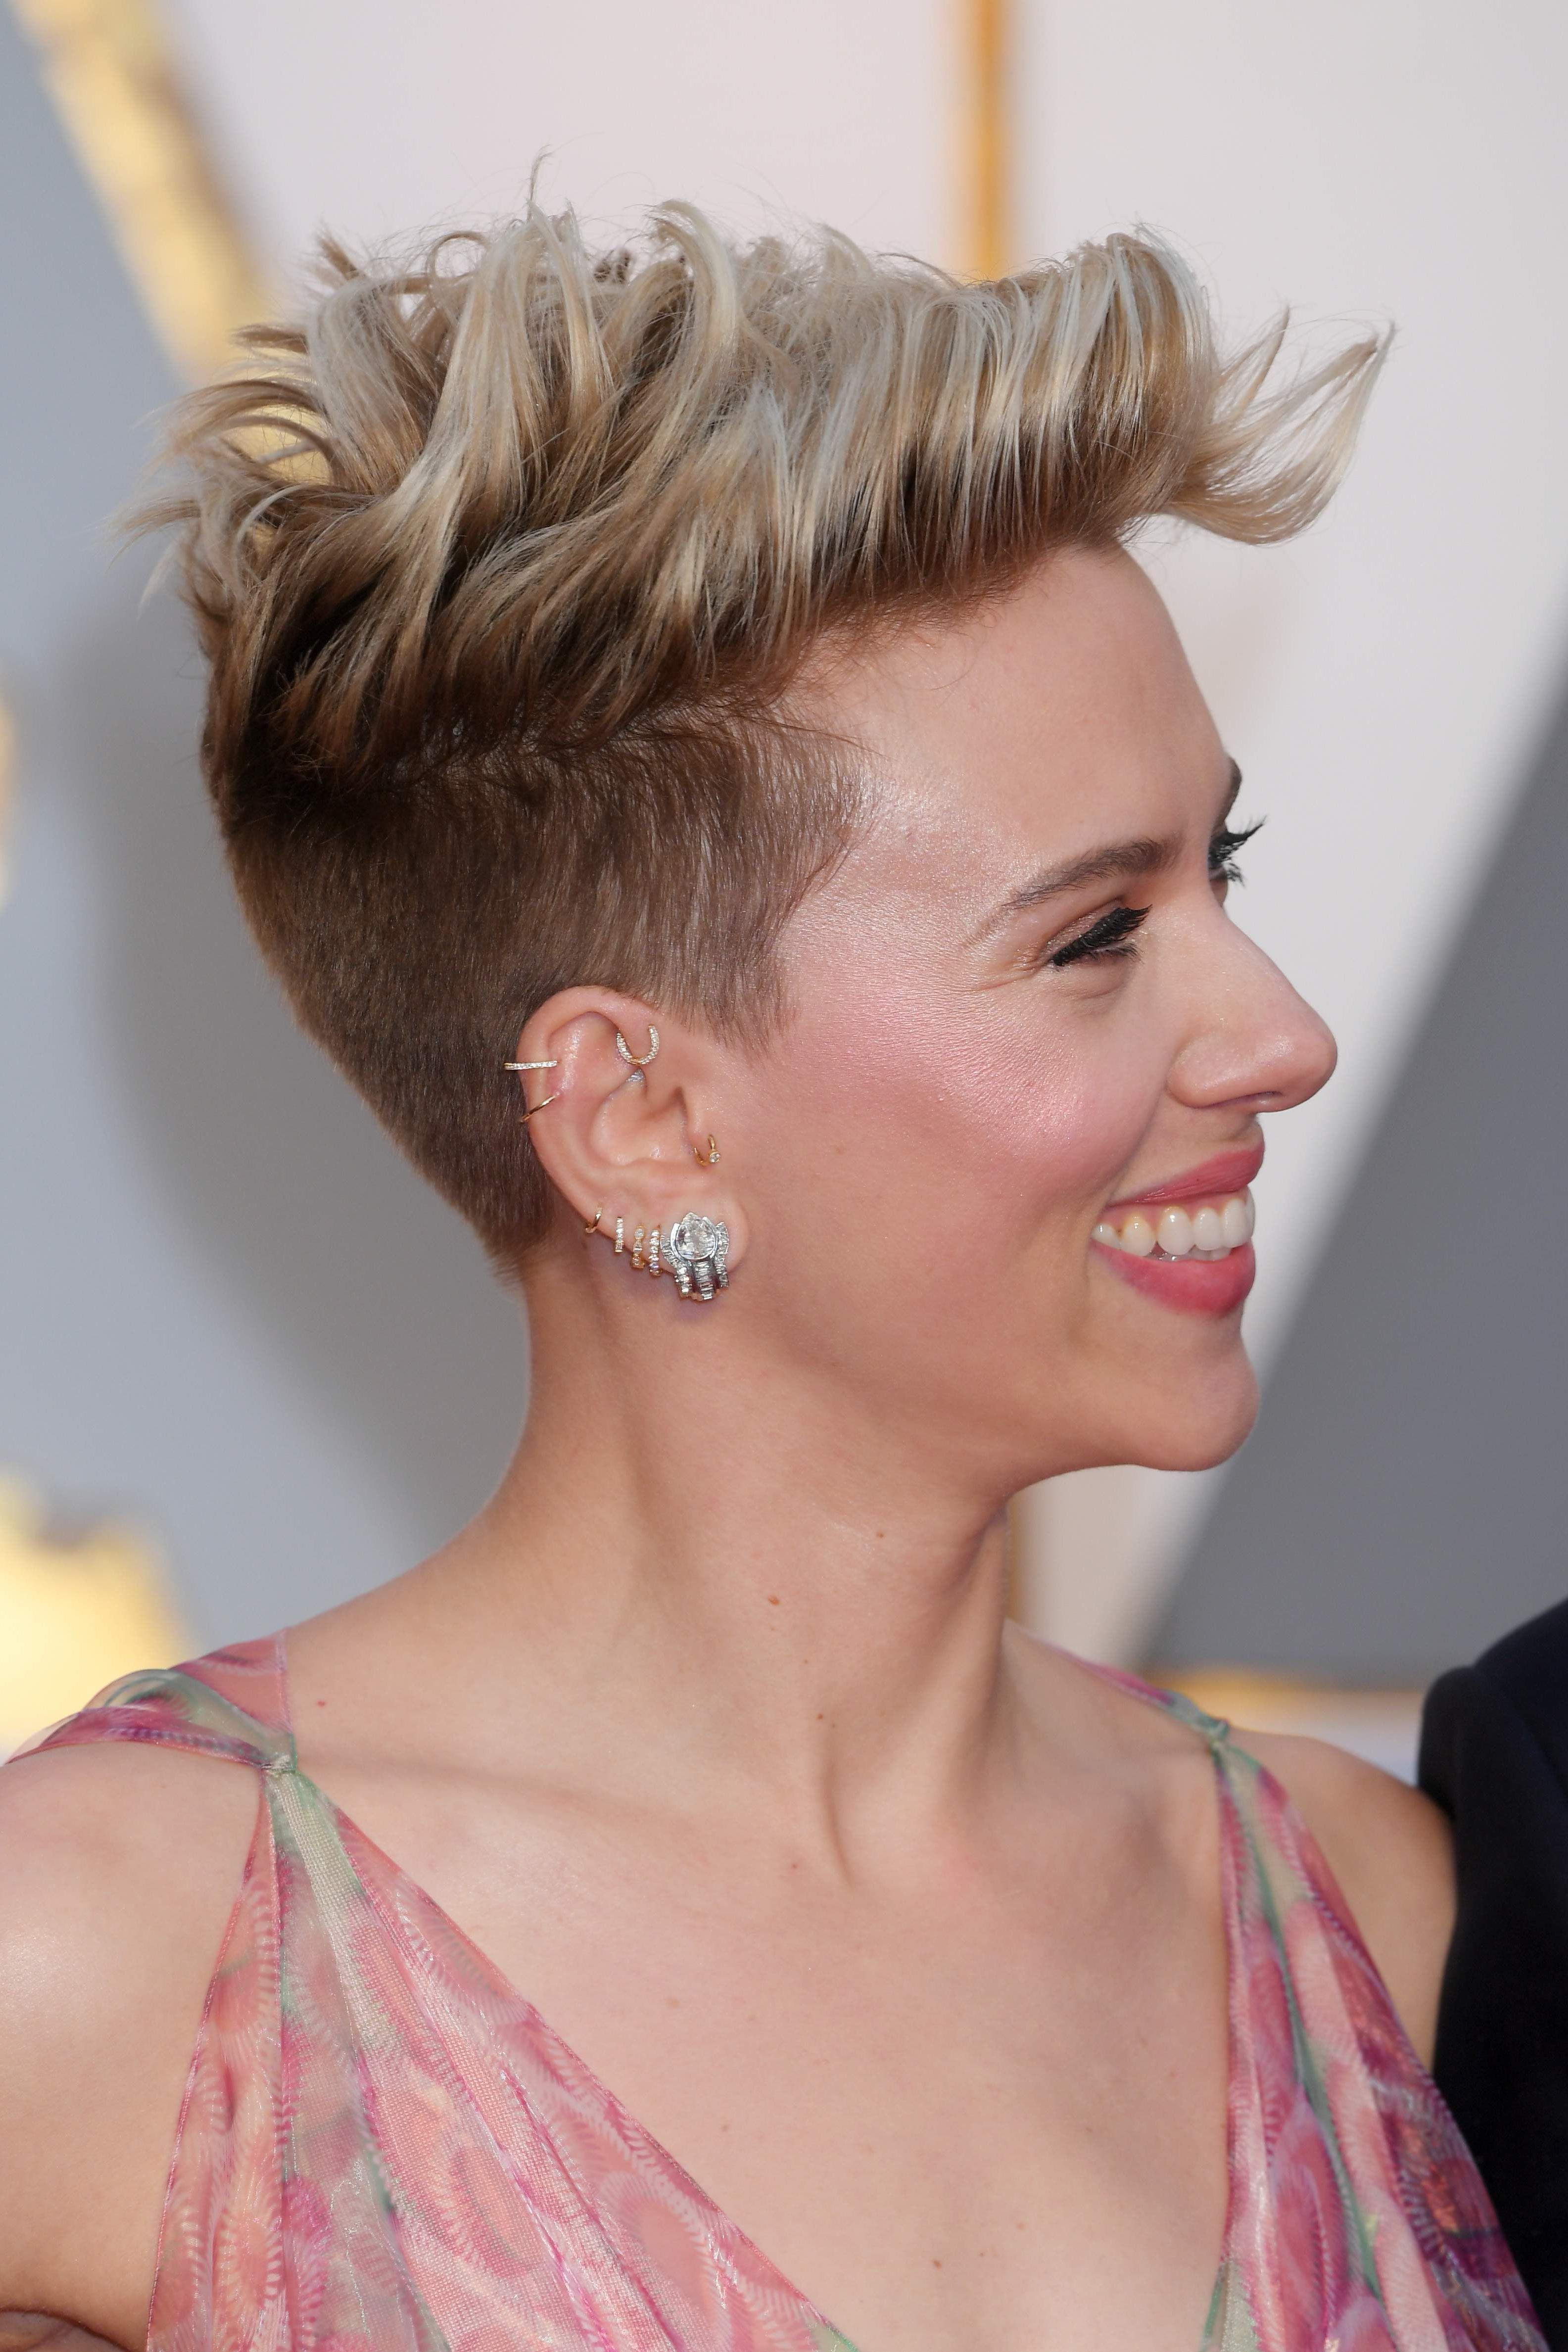 Scarlett Johansson Short Hairstyles Inspirational Lovely Scarlett Throughout Scarlett Johansson Short Hairstyles (View 10 of 25)